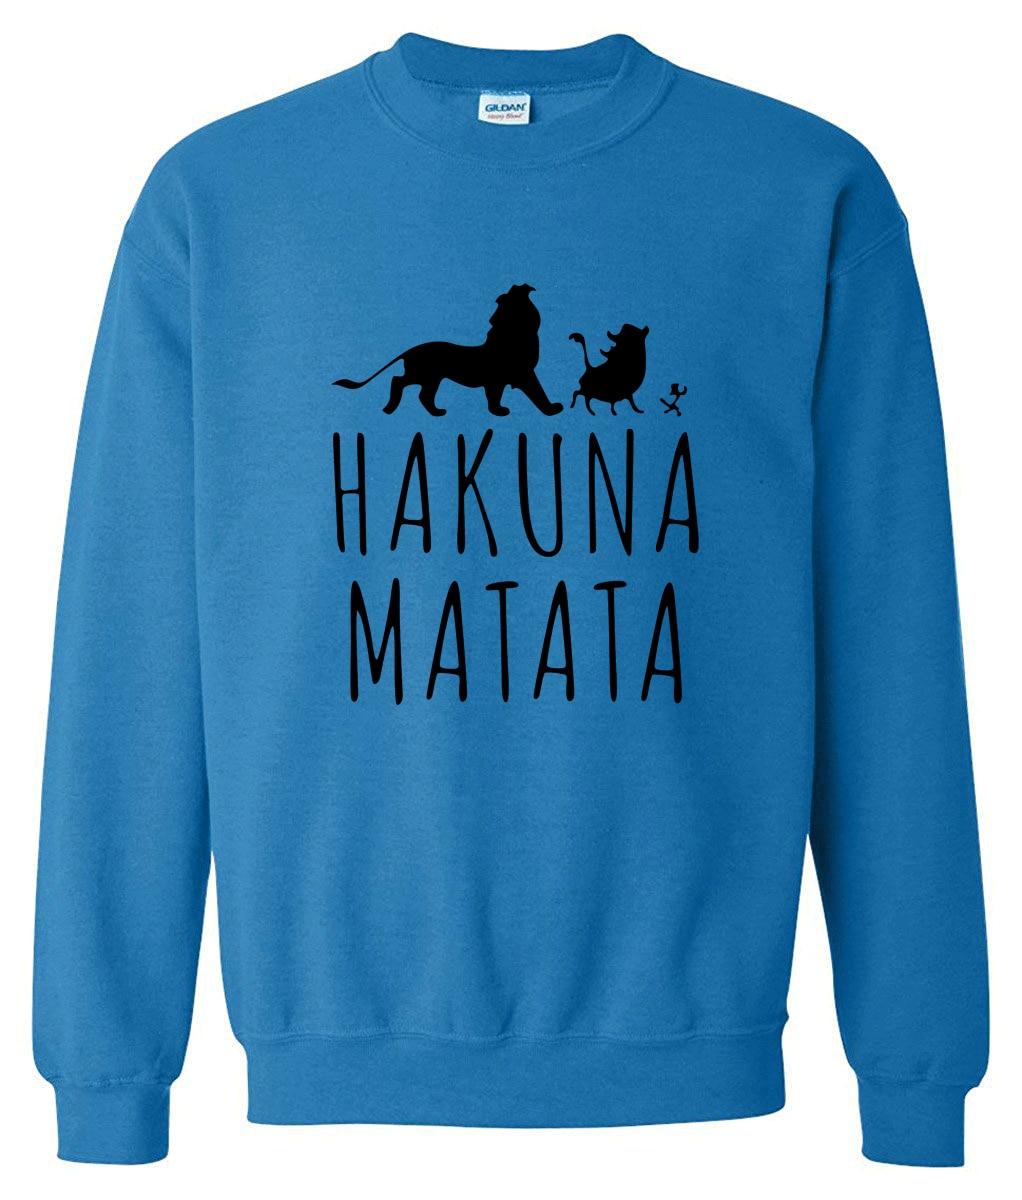 New arrival 2019 spring sweatshirt winter hoody fleece HAKUNA MATATA funny letter print hot men's sportswear hoodies harajuku